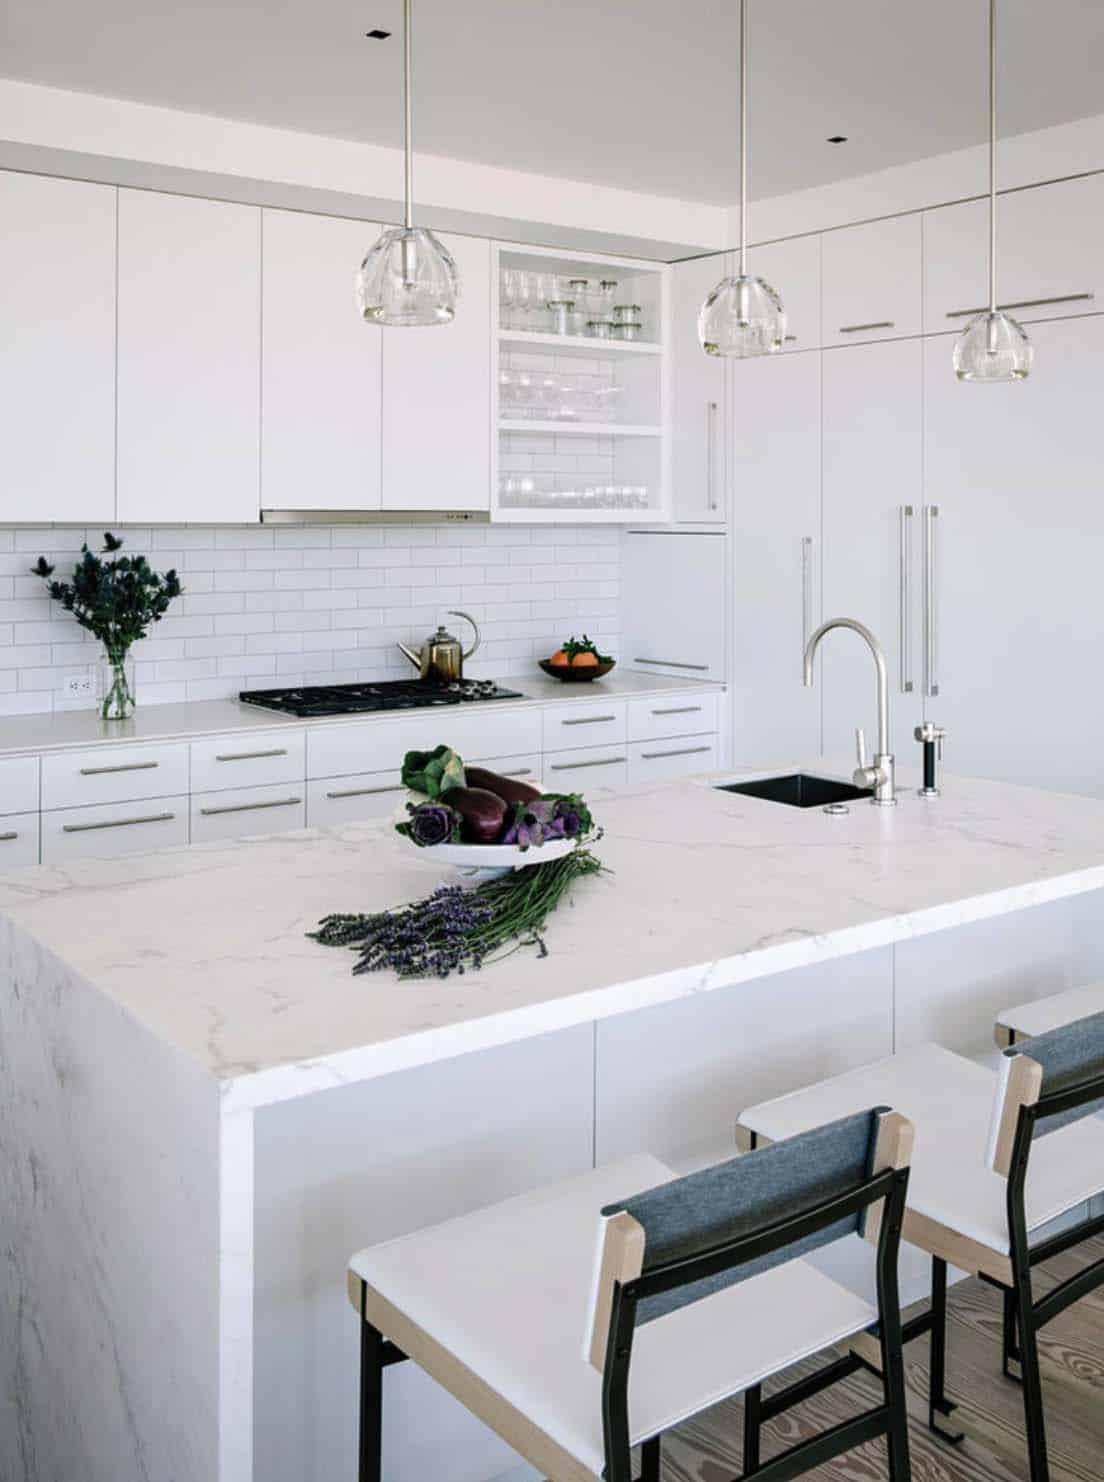 Mid-Century Modern Home-John Maniscalco Architecture-23-1 Kindesign